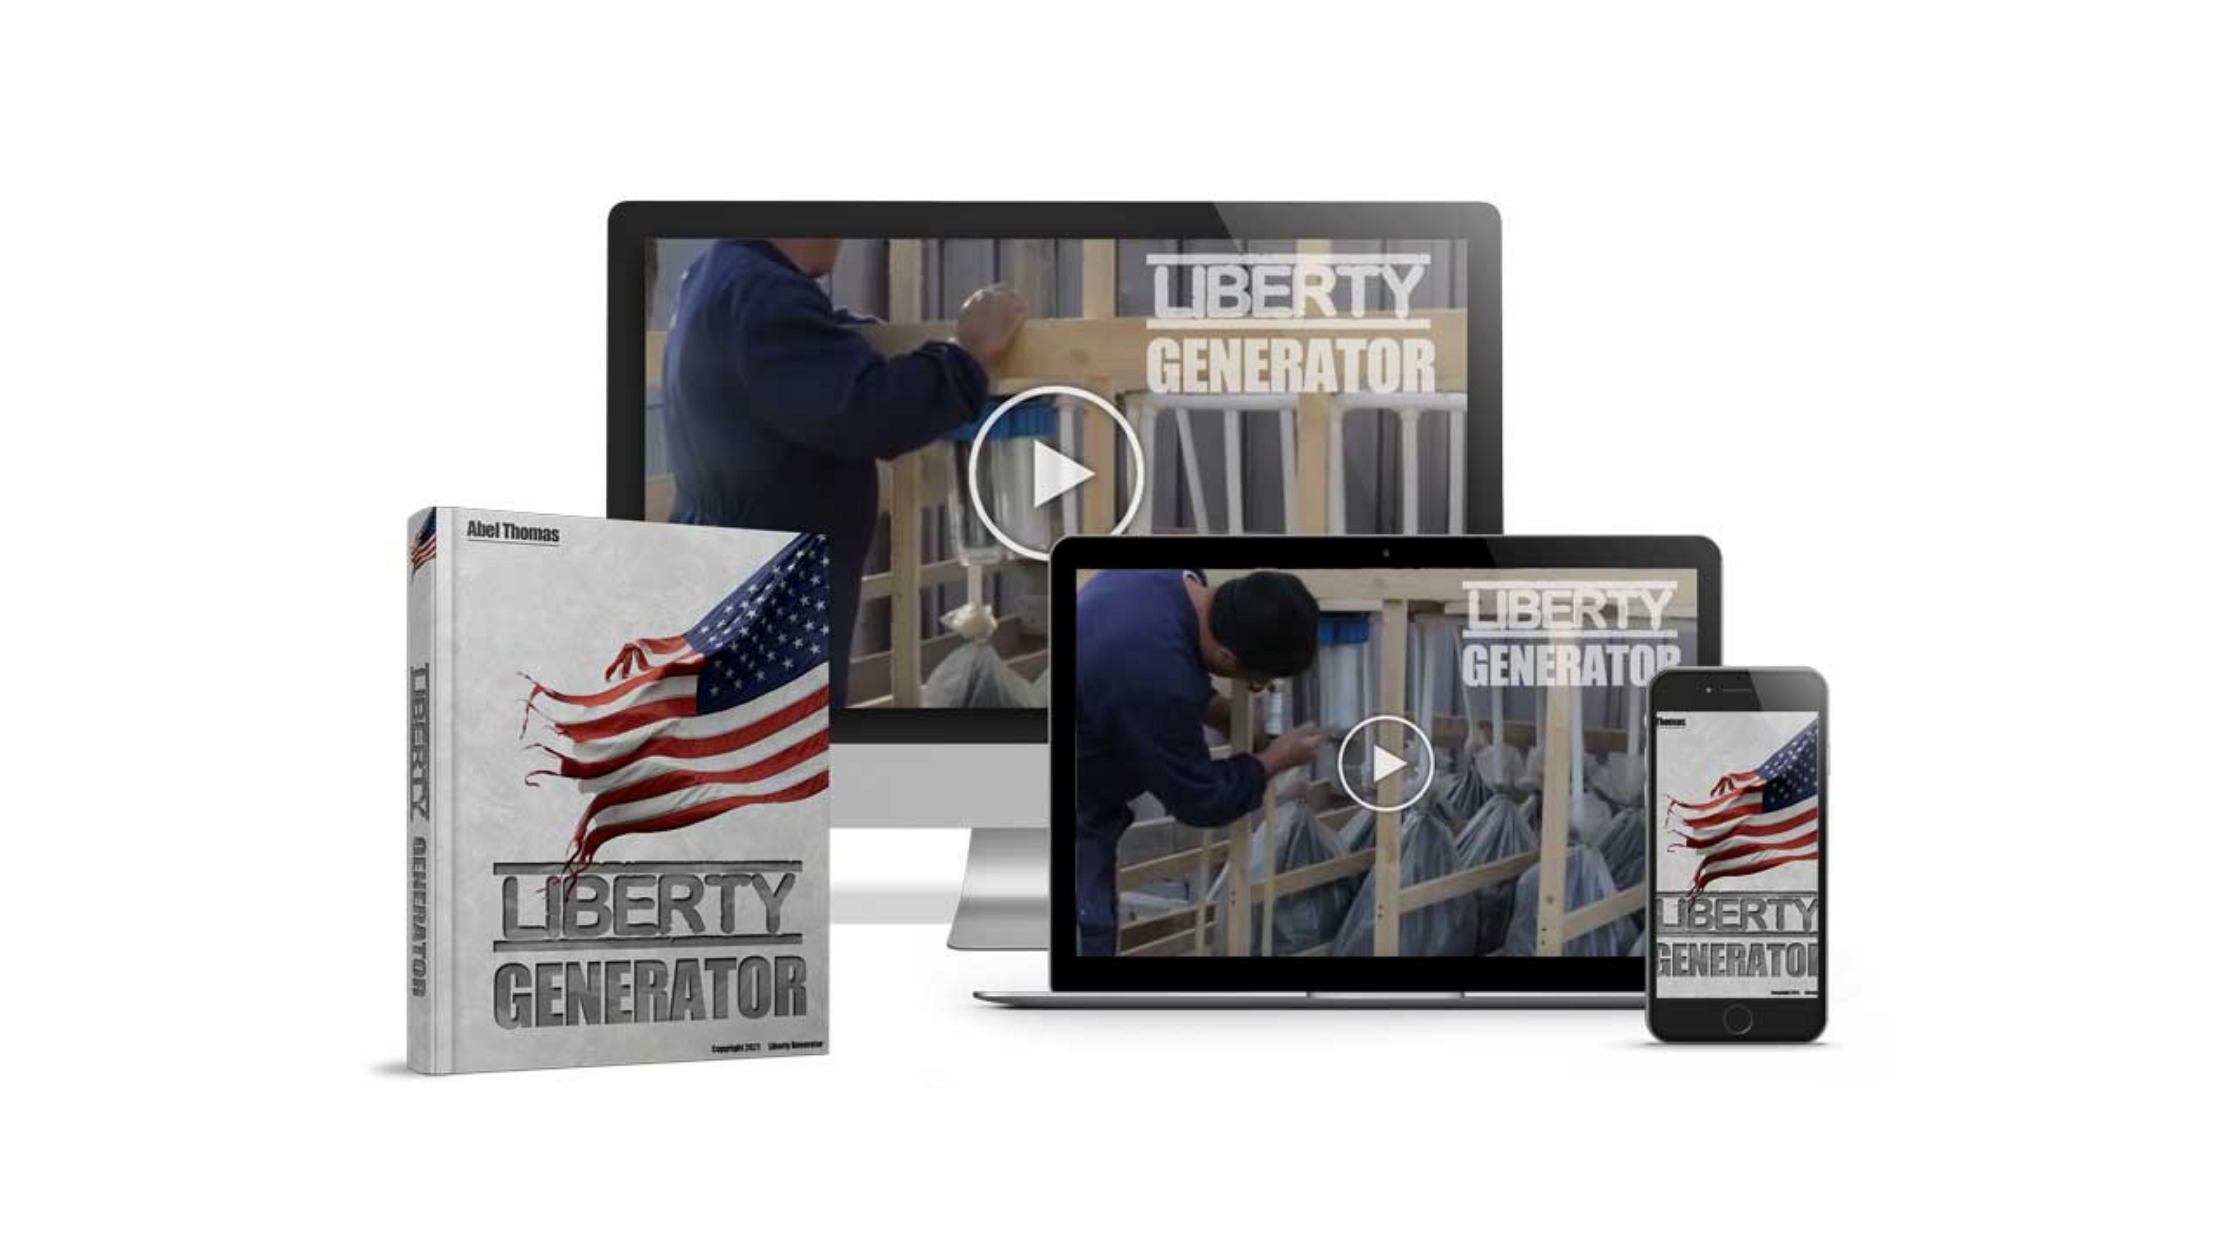 Liberty Generator Pros & Cons